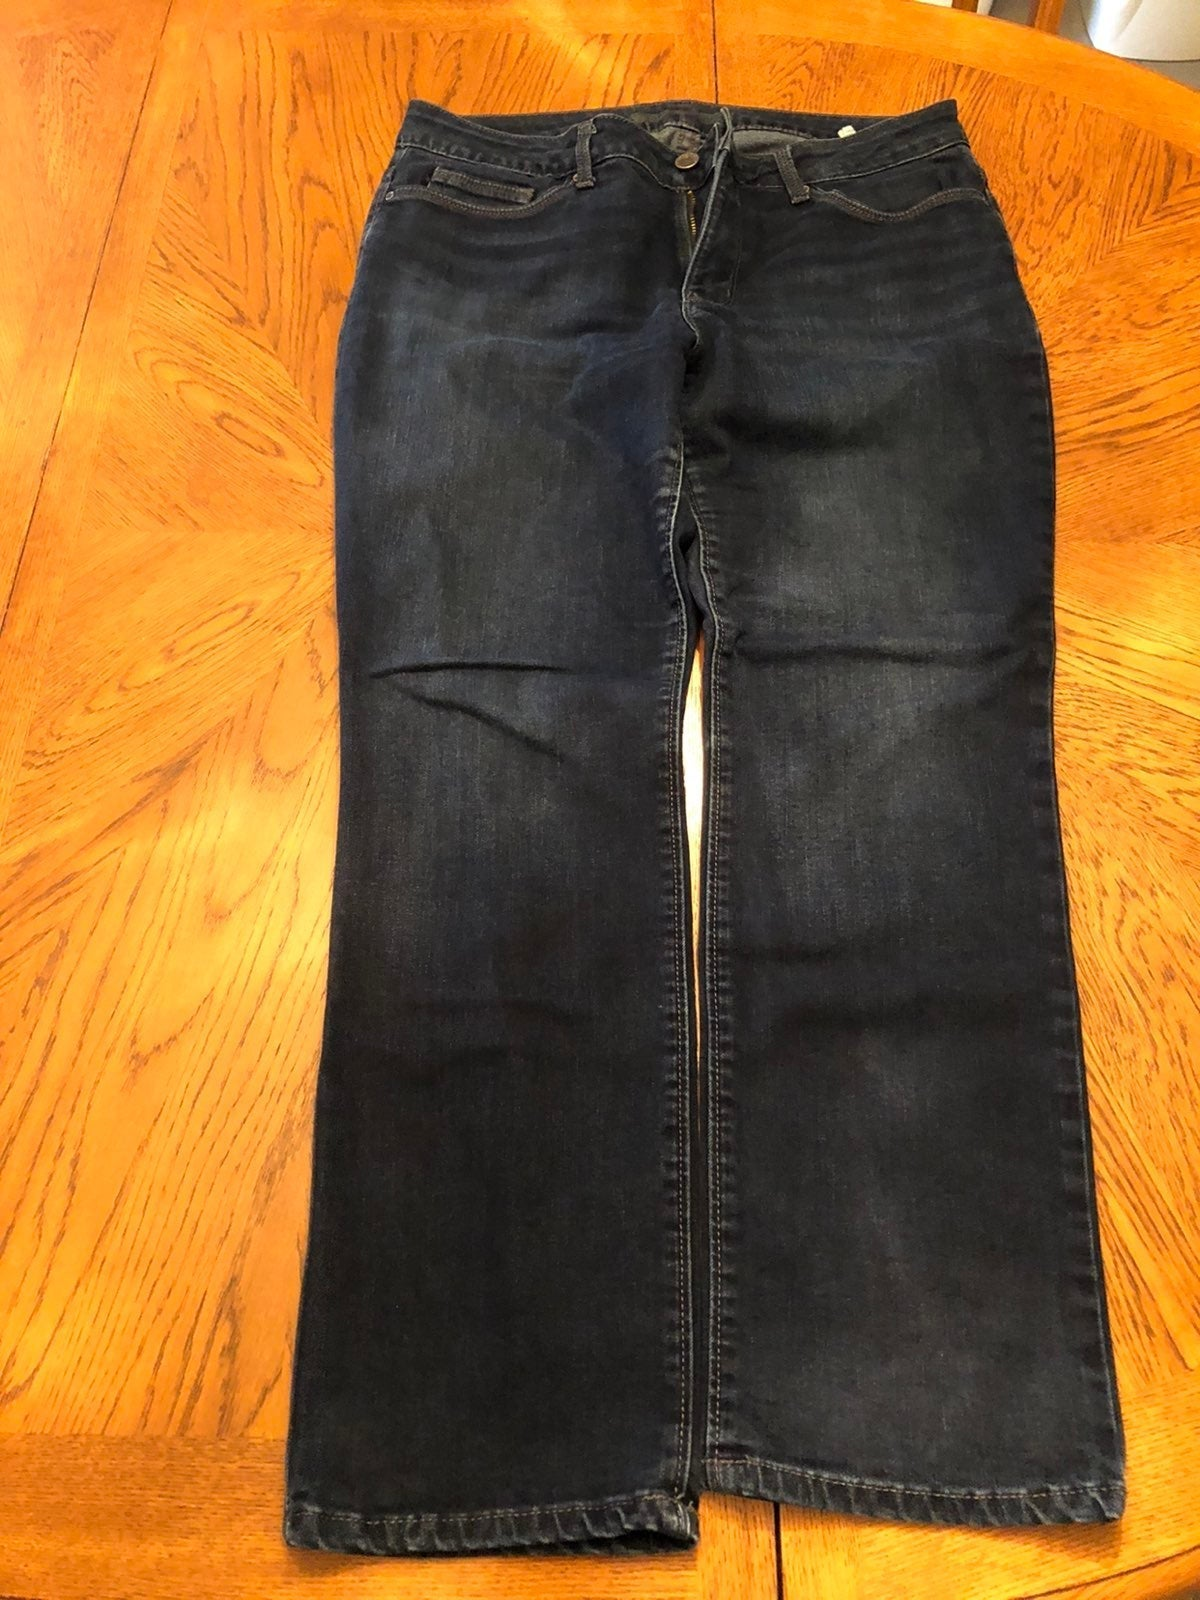 Jeans women lee curvy fit size 14 short